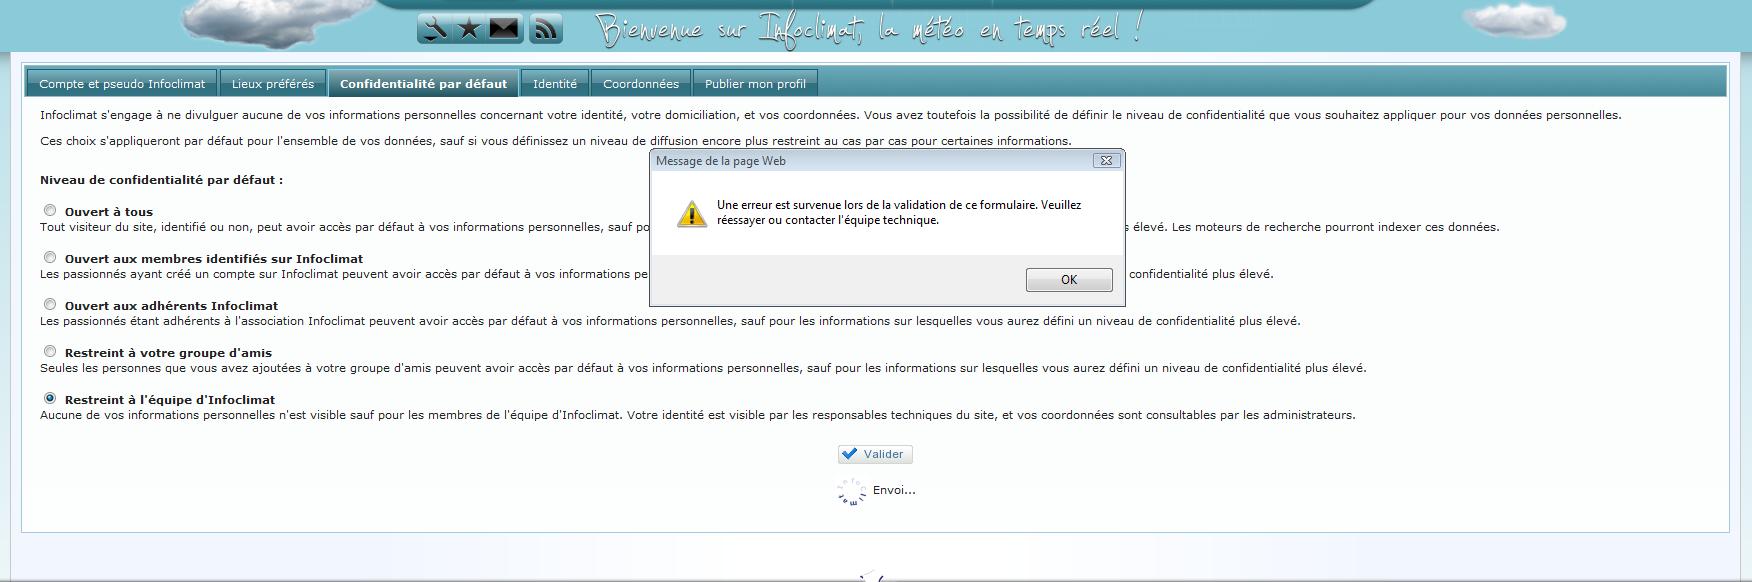 Infoclimat-WindowsInternetExplorer_2011-